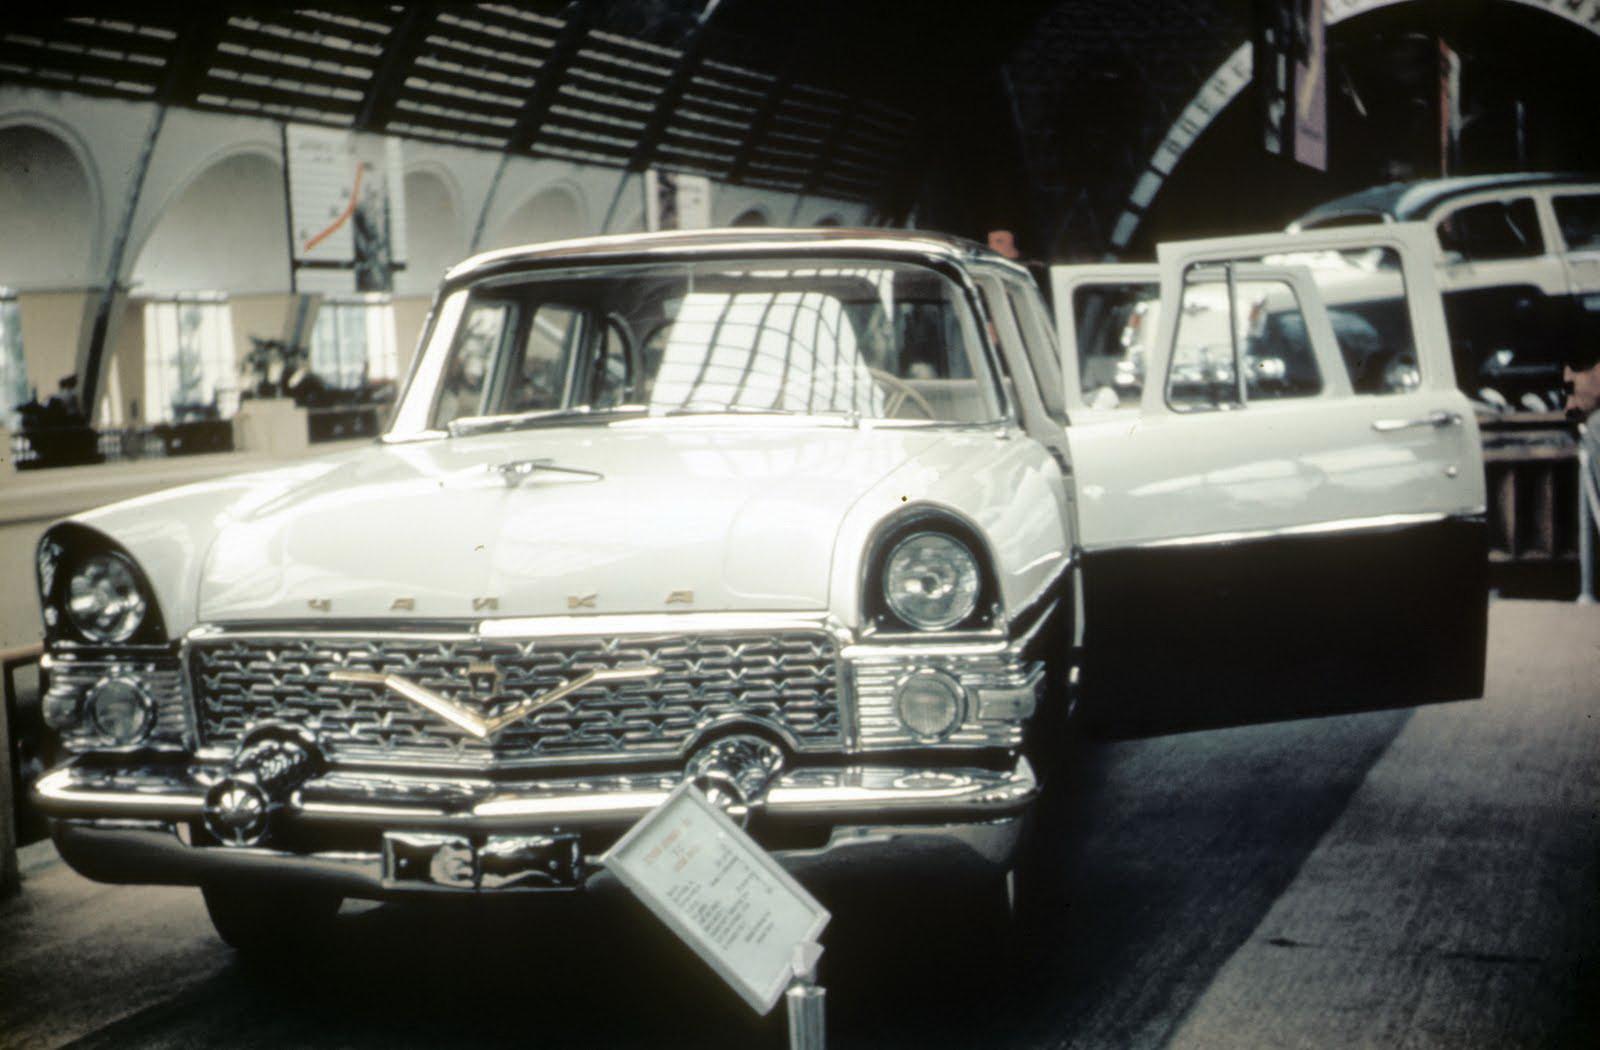 1958 Павильон машиностроение на ВДНХ.  John Shultz